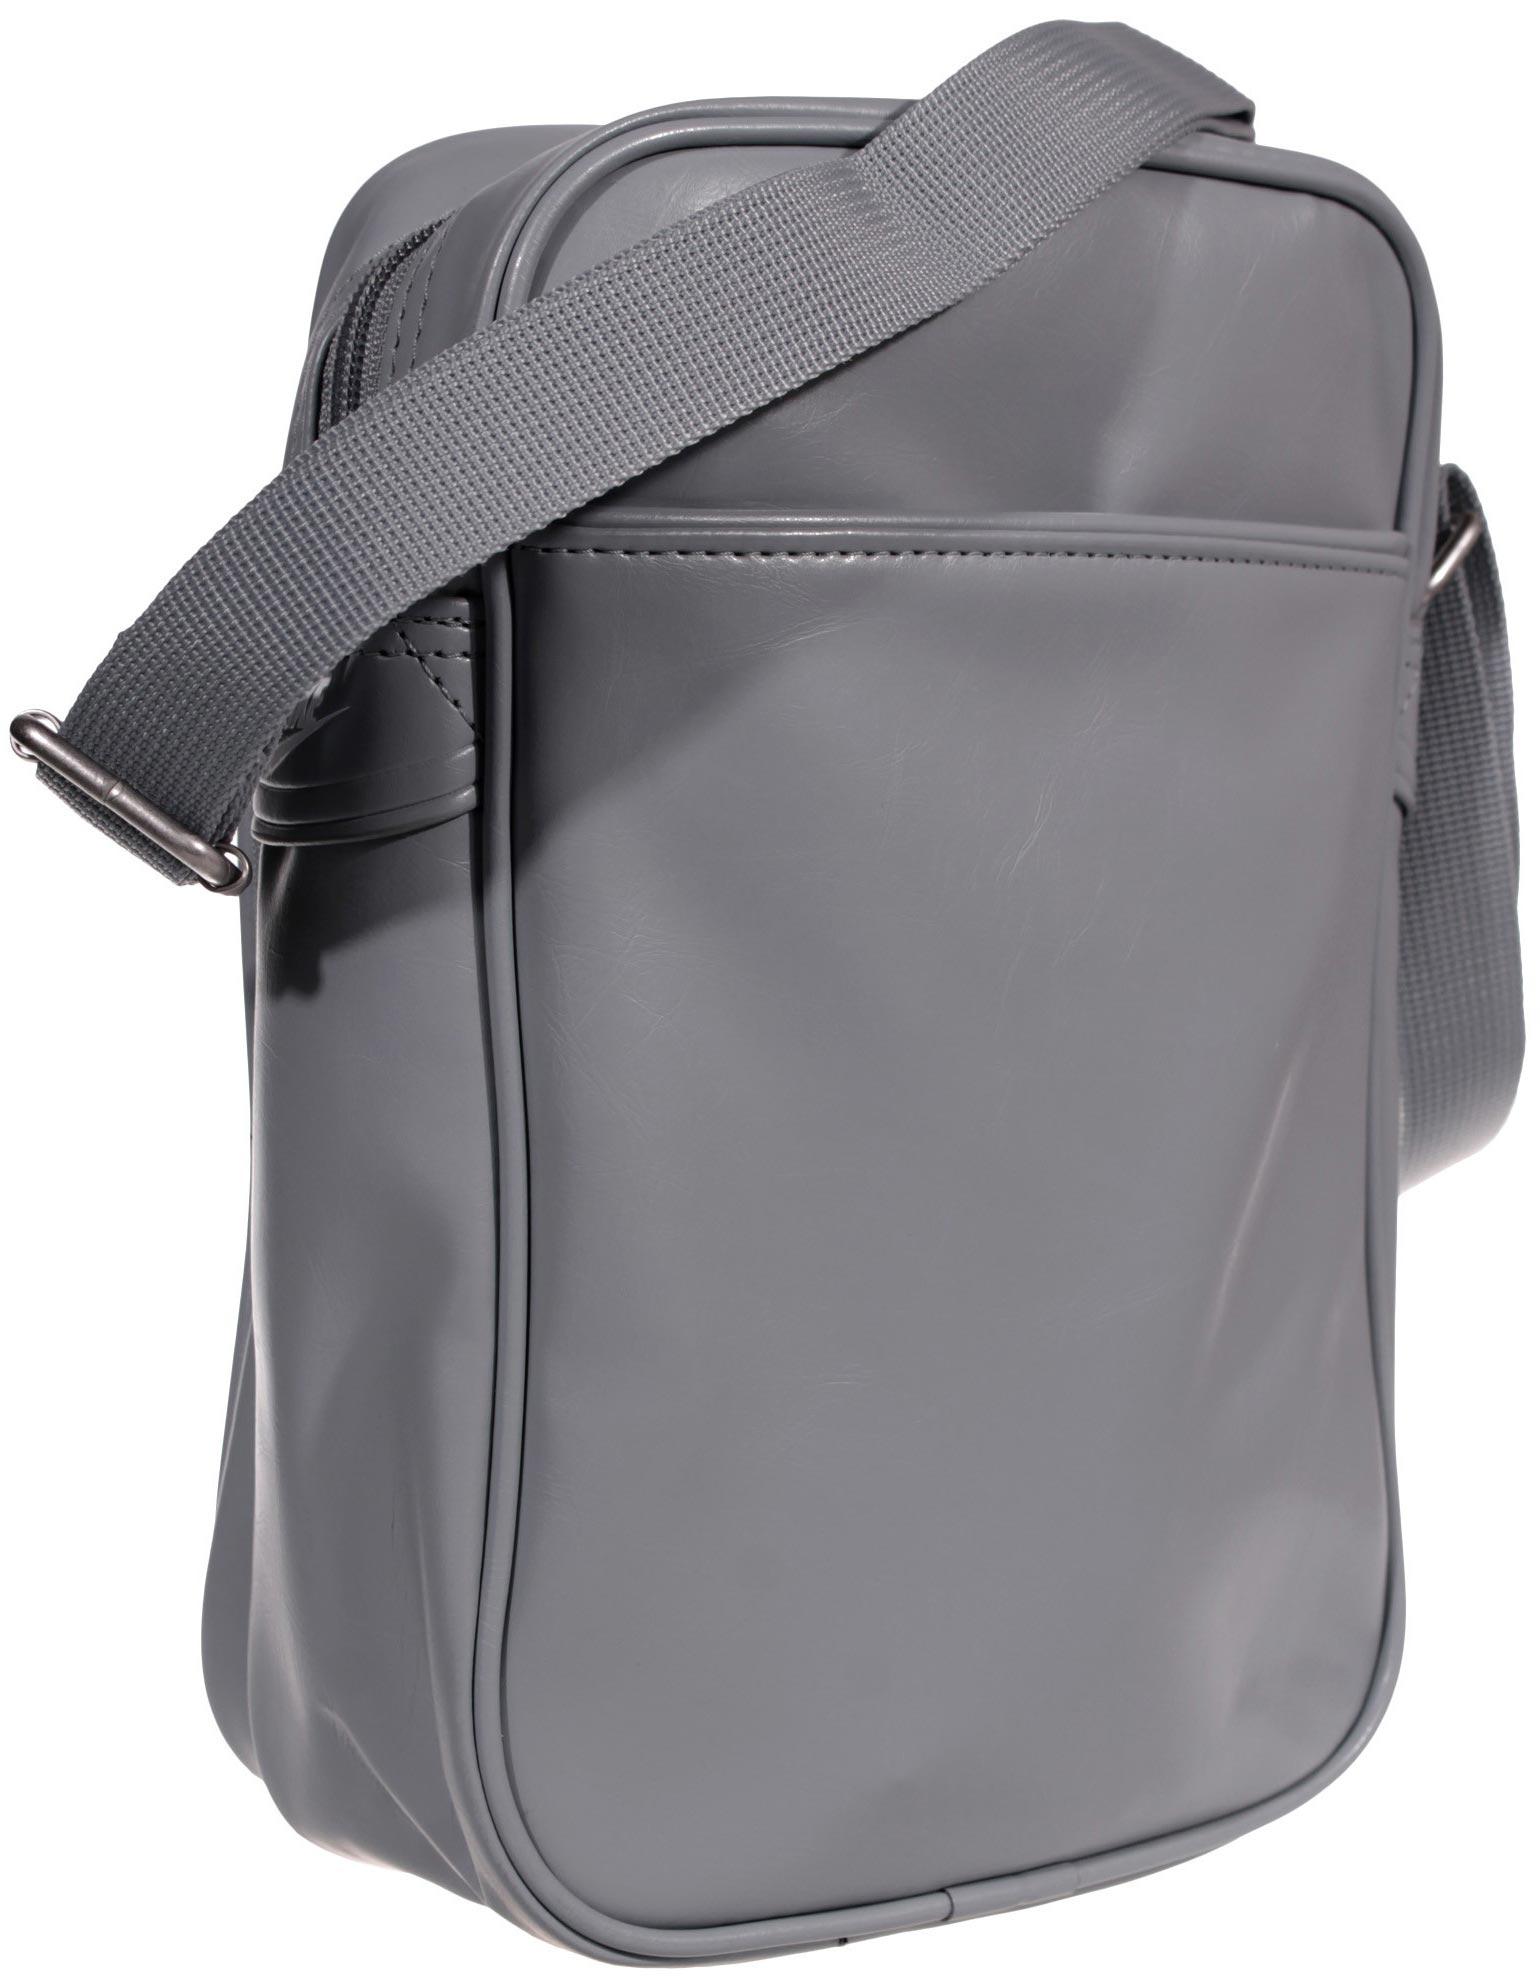 3d4496da47 HERITAGE SI SMALL ITEMS II - Document bag